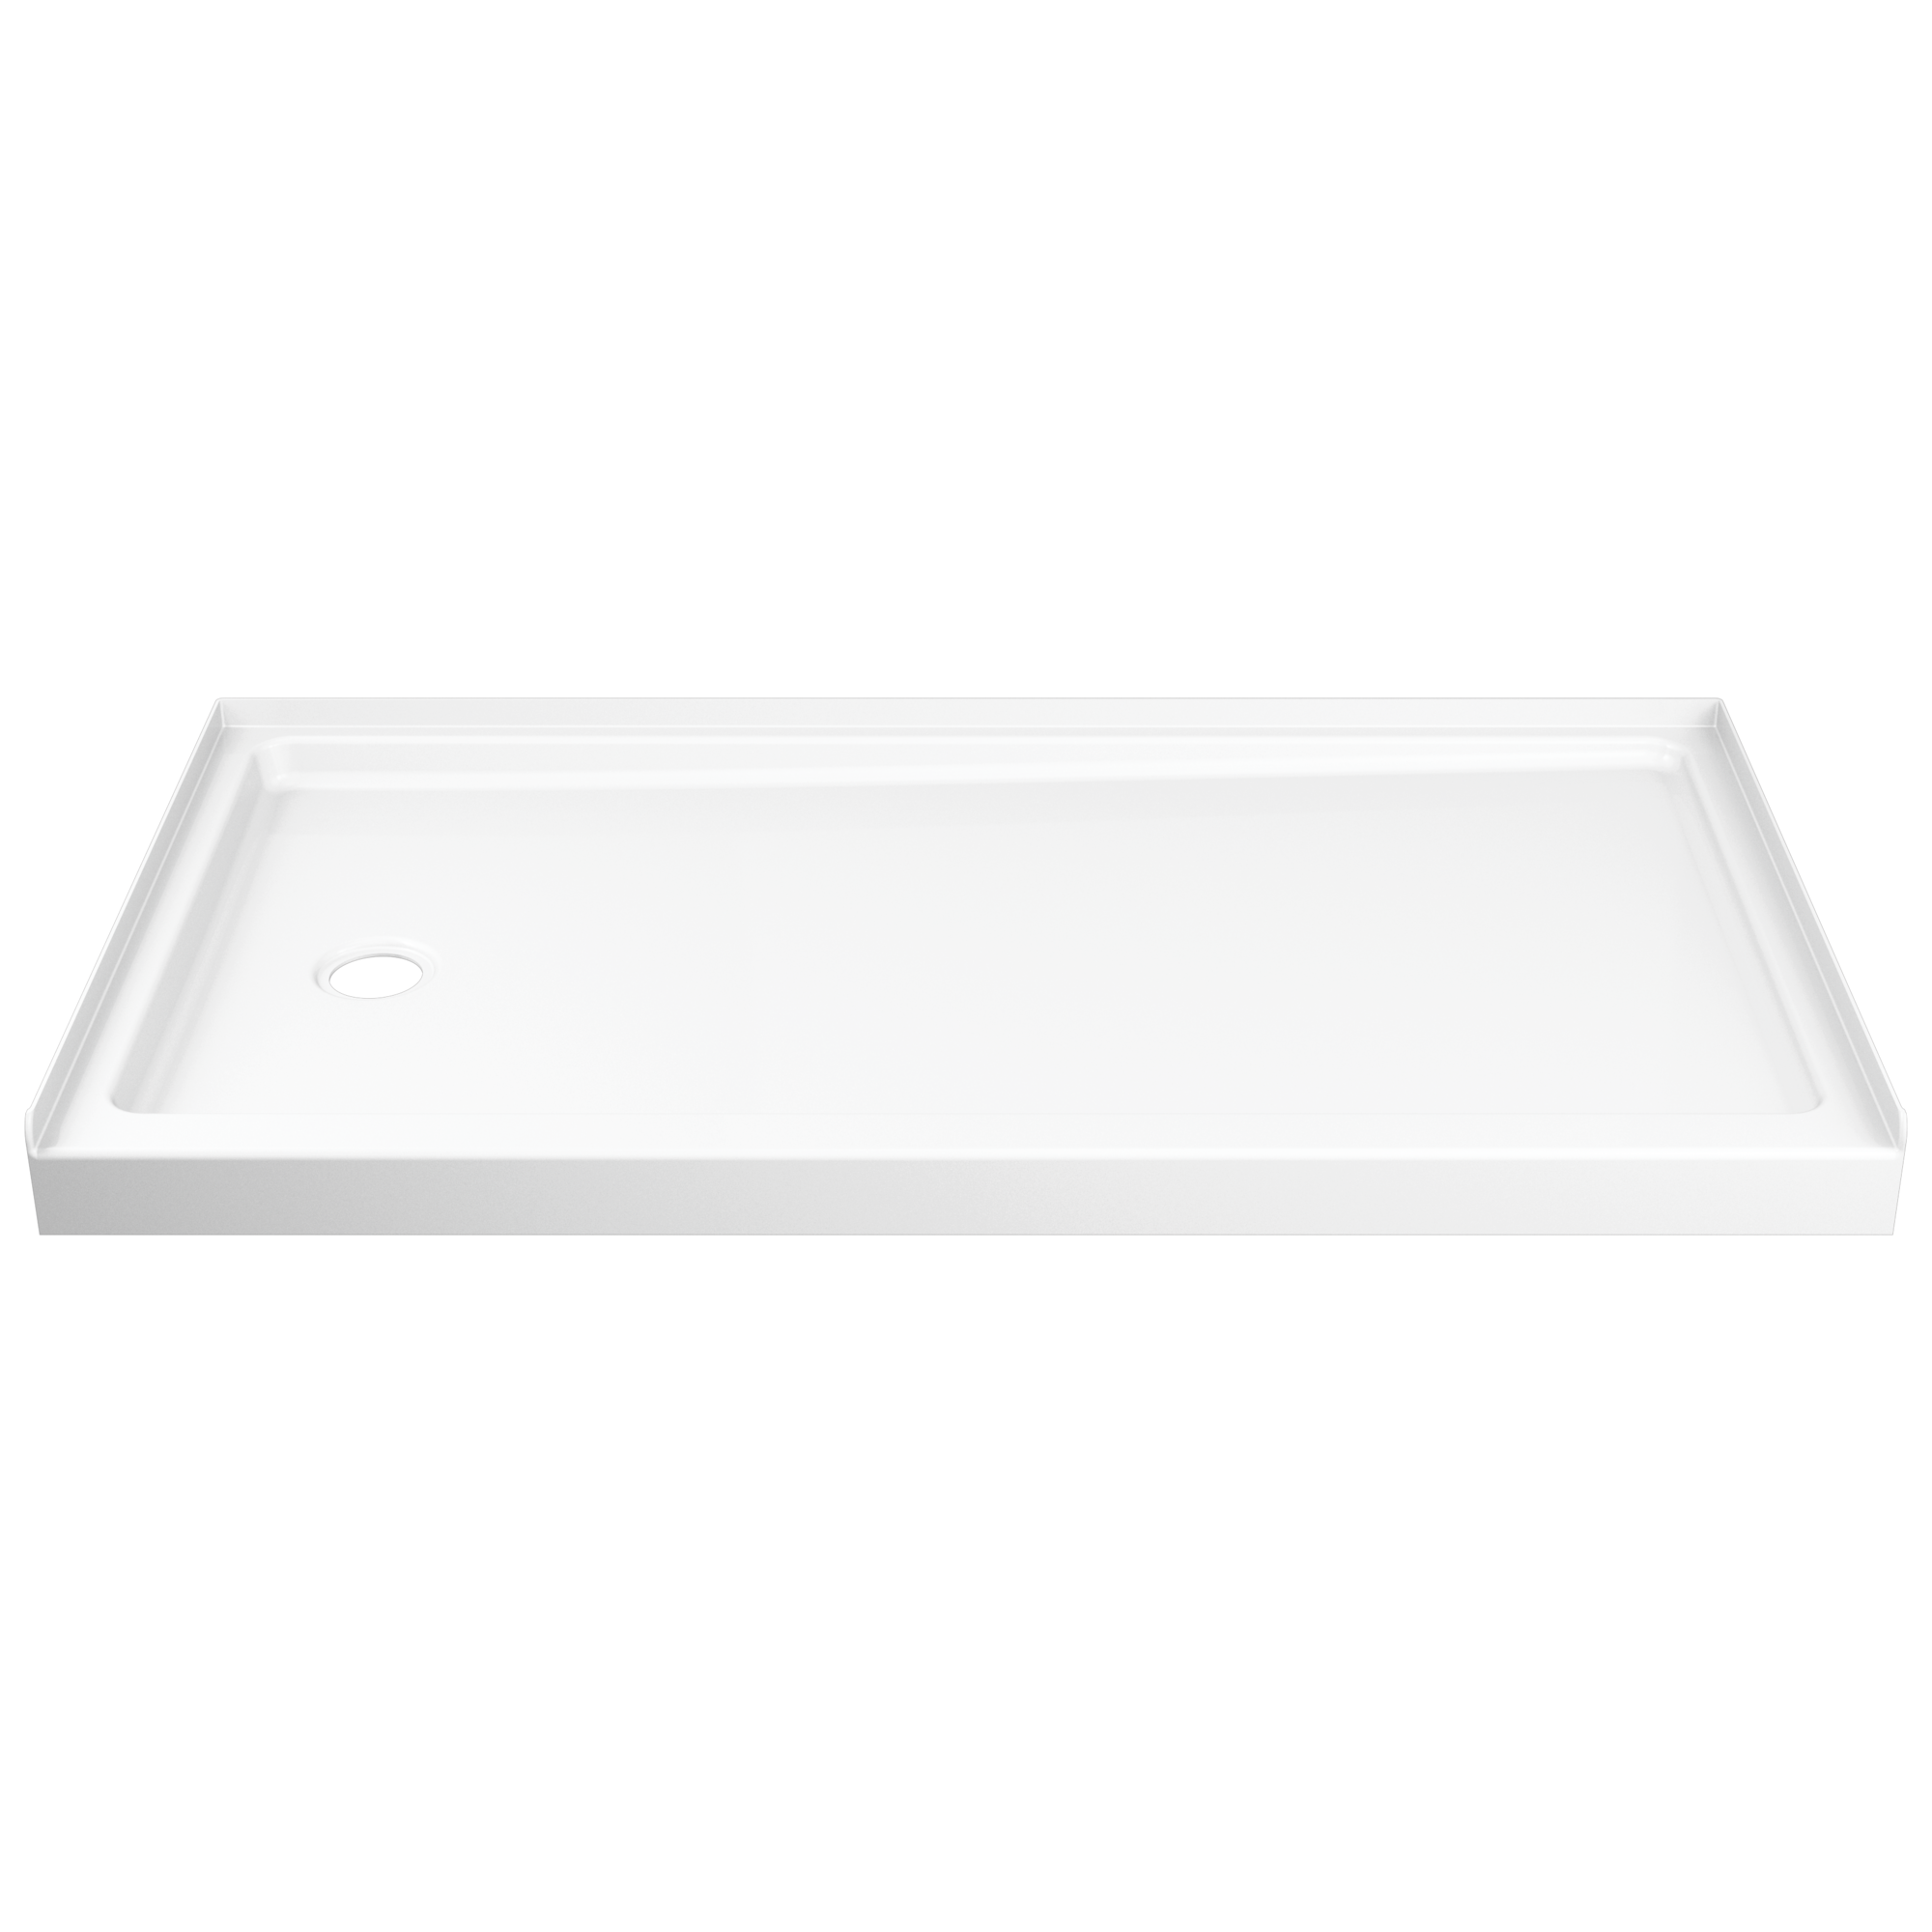 Delta B78615-6032L-WH ProCrylic Shower Base 60 x 32 High Gloss White